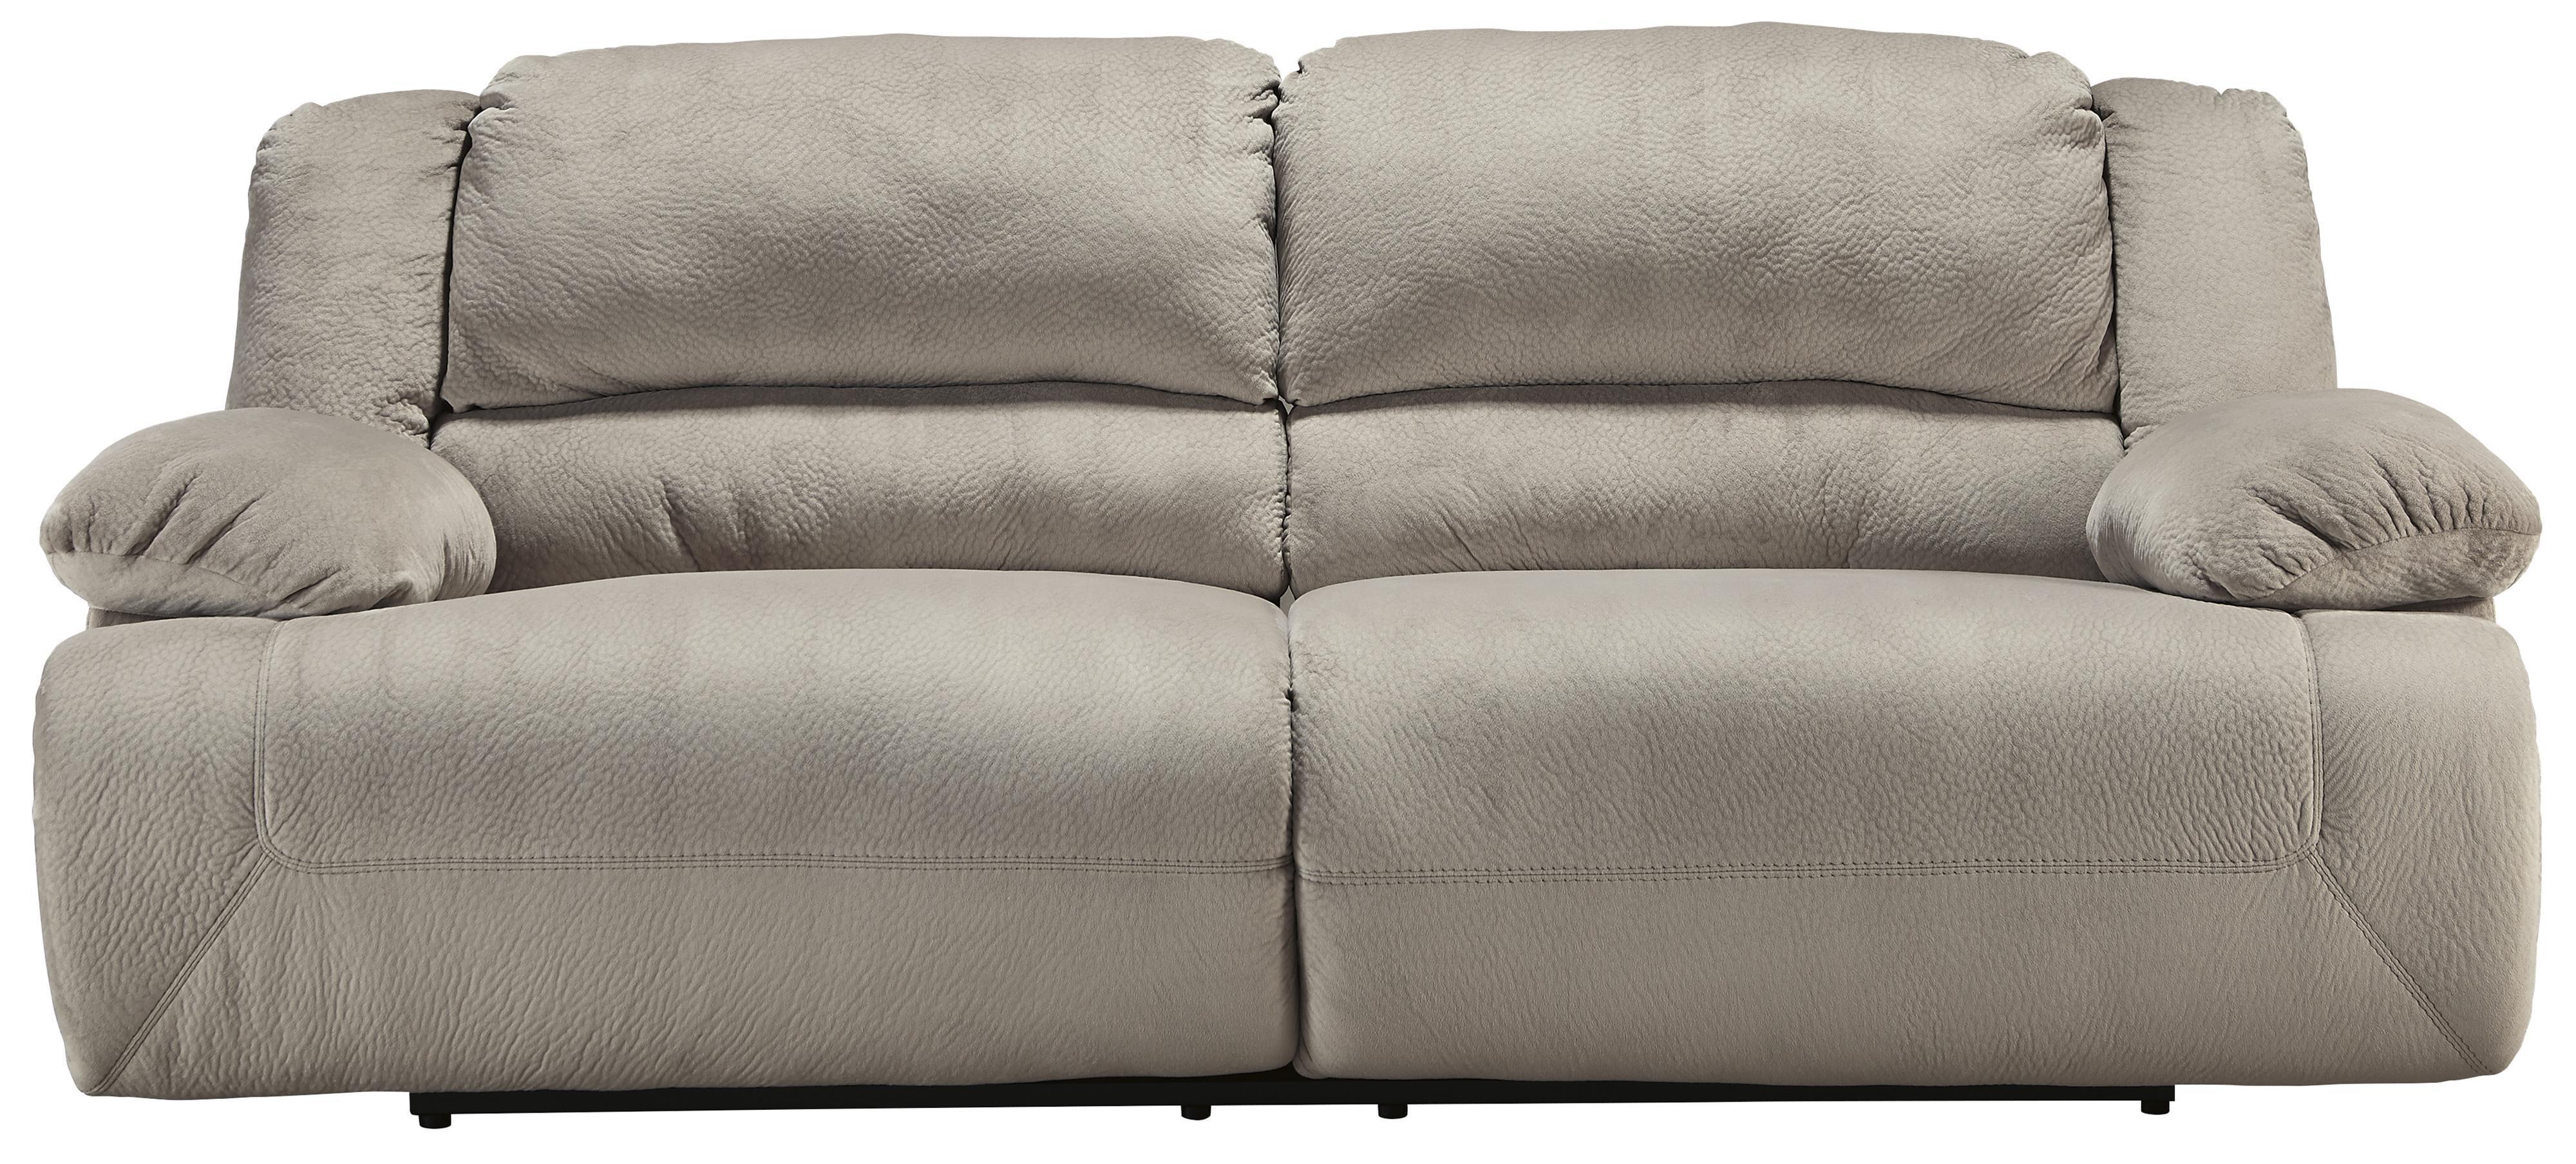 Signature Designashley Toletta – Granite Casual Contemporary 2 With Regard To 2 Seat Recliner Sofas (View 11 of 20)